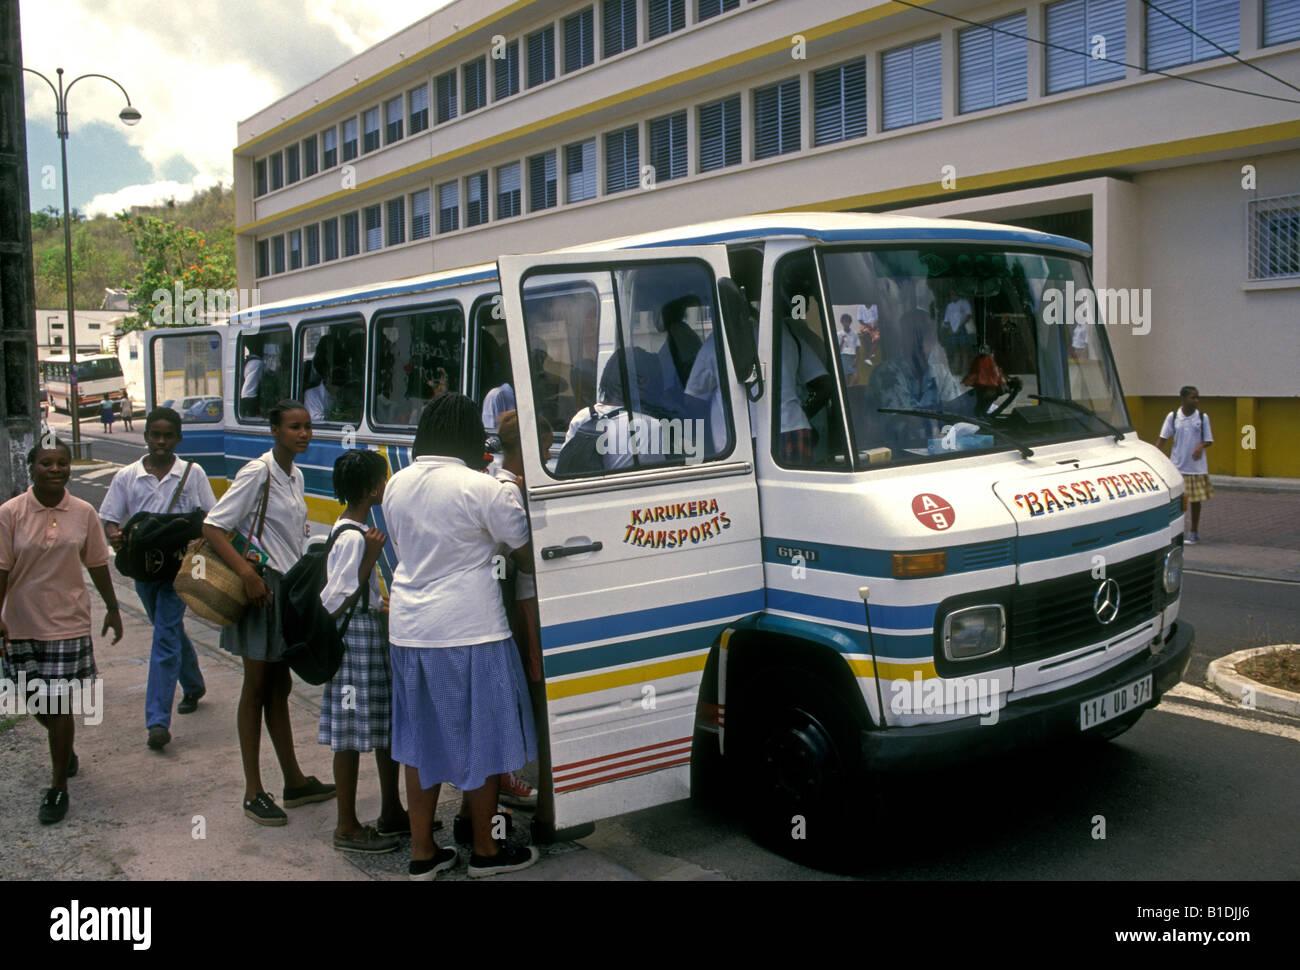 French students, schoolgirl, schoolgirls, boarding school bus, College Courbaril, school, Pointe-Noire, Basse-Terre, - Stock Image